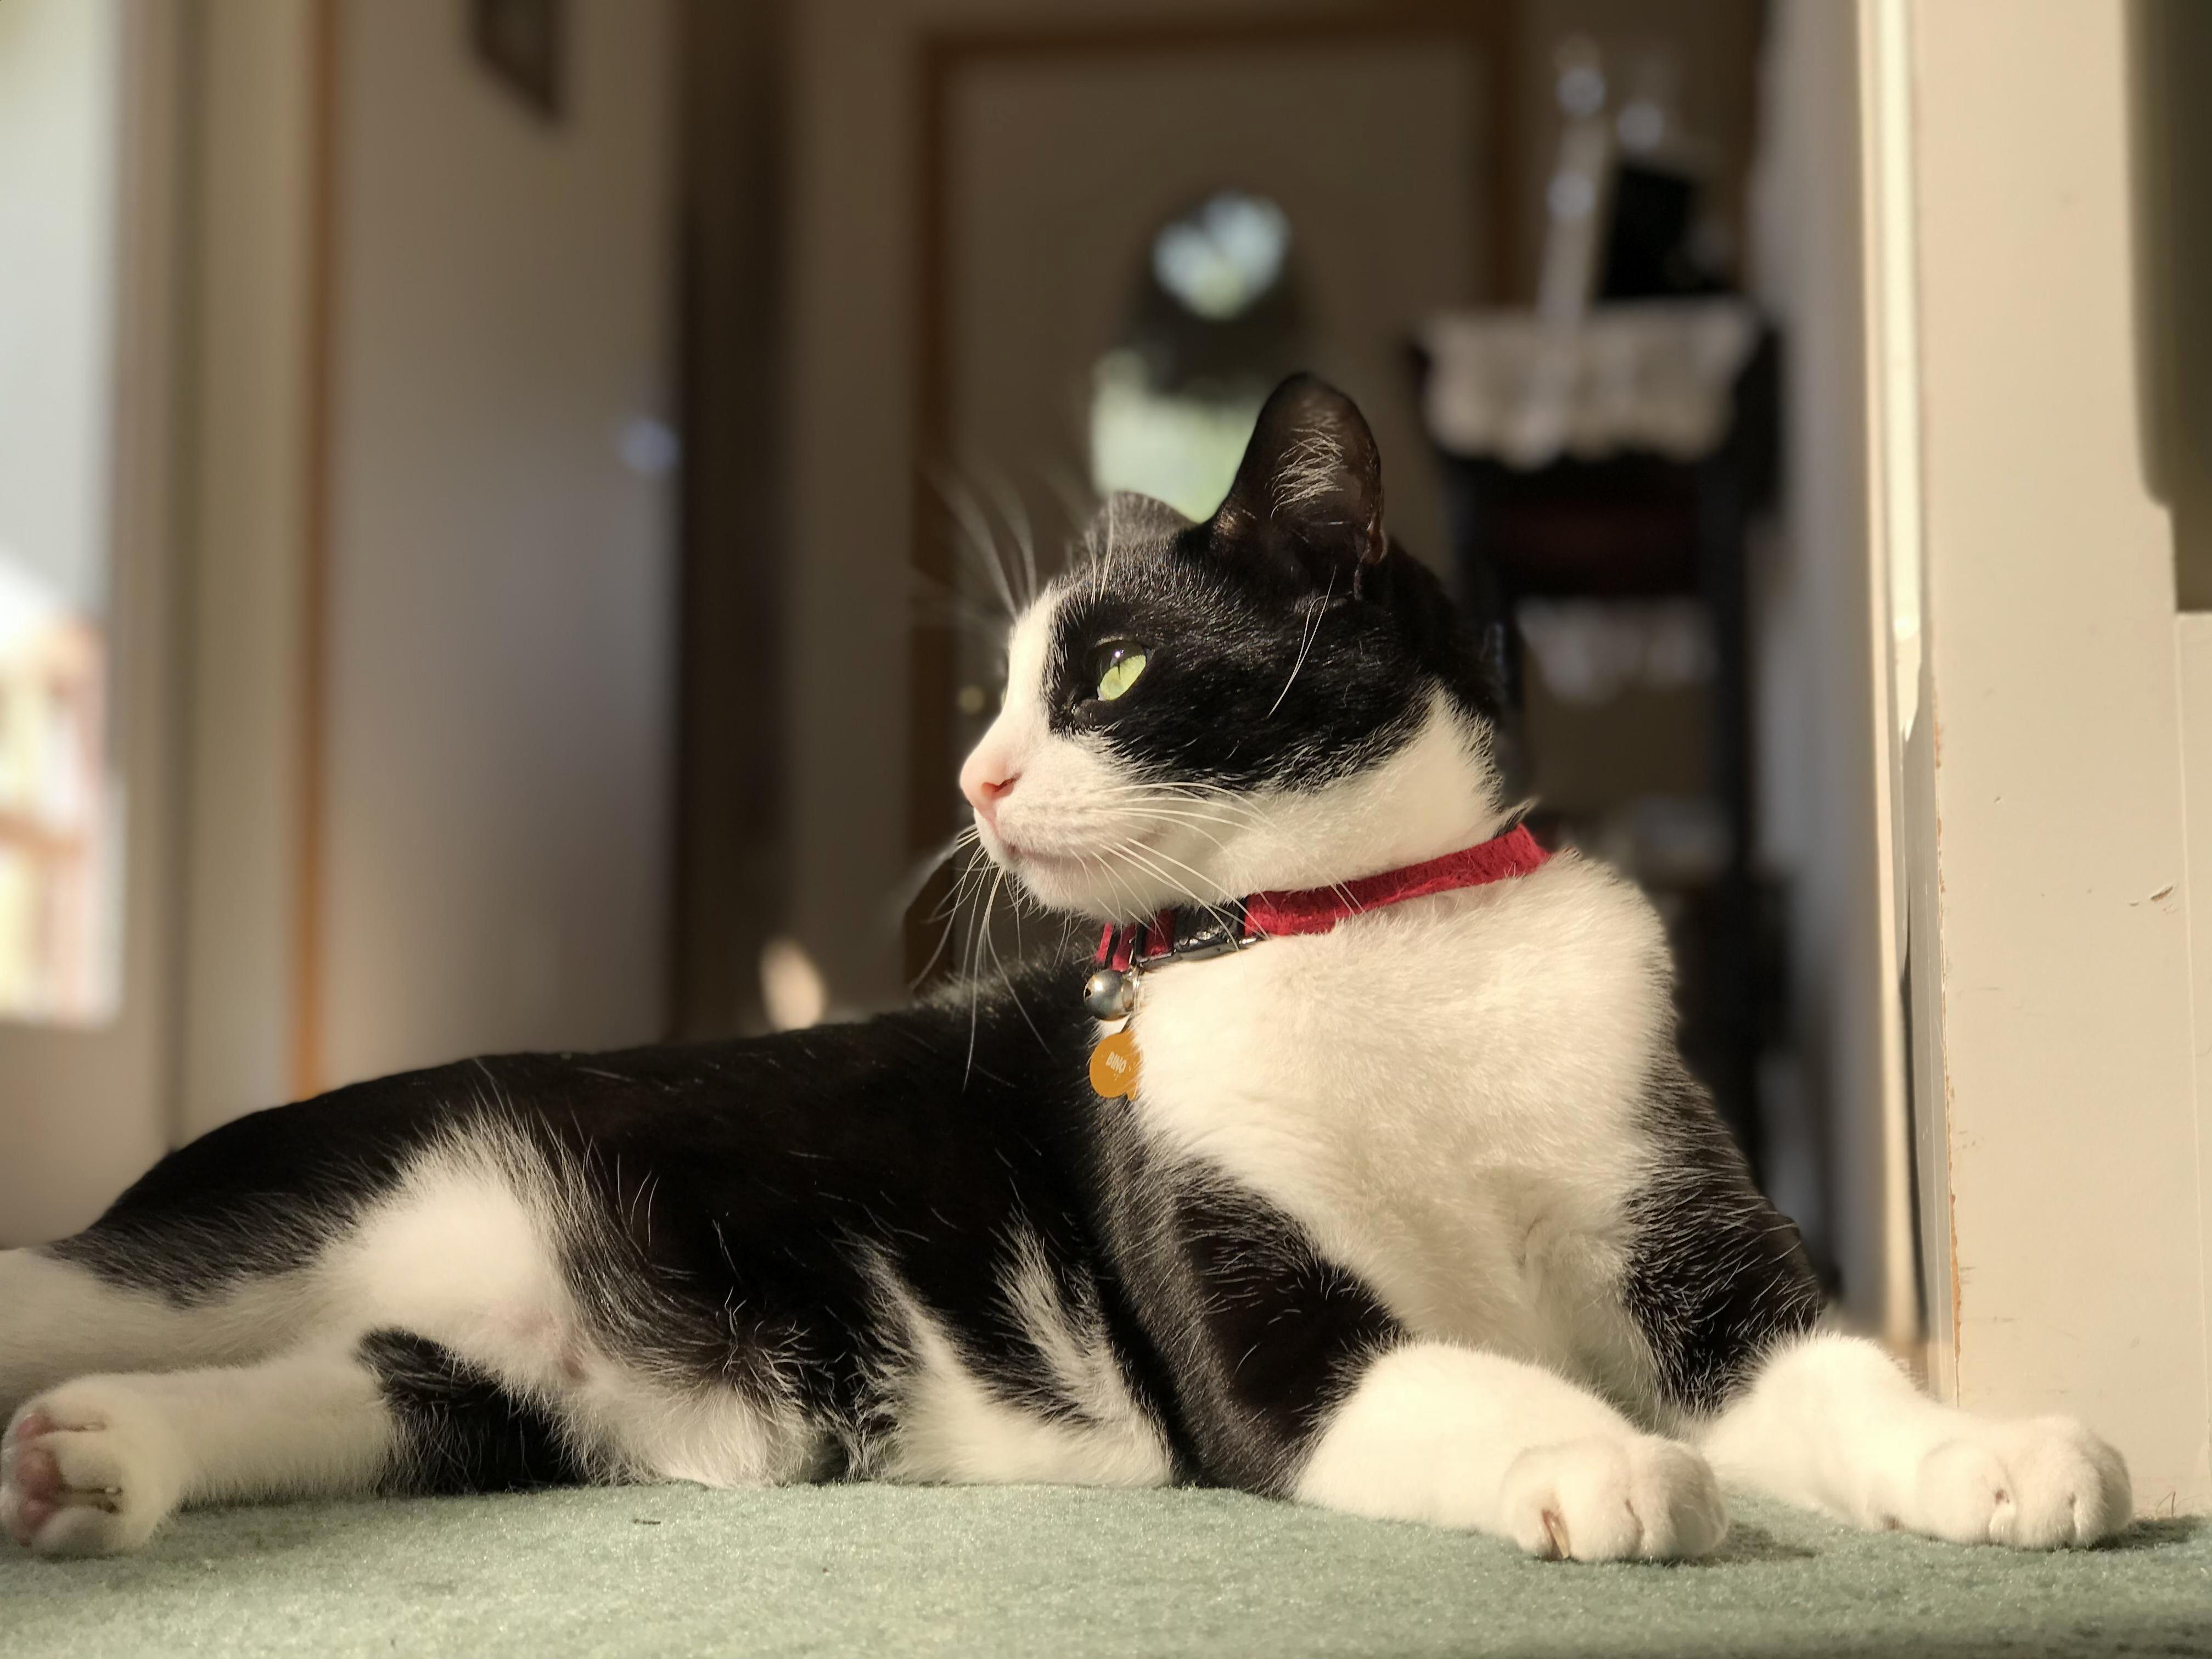 5 Inspirasi Nama Untuk Kucing Peliharaan Di Hari Valentine 14 Februari 2019 Penuh Makna Berkesan Halaman All Tribun Kaltim